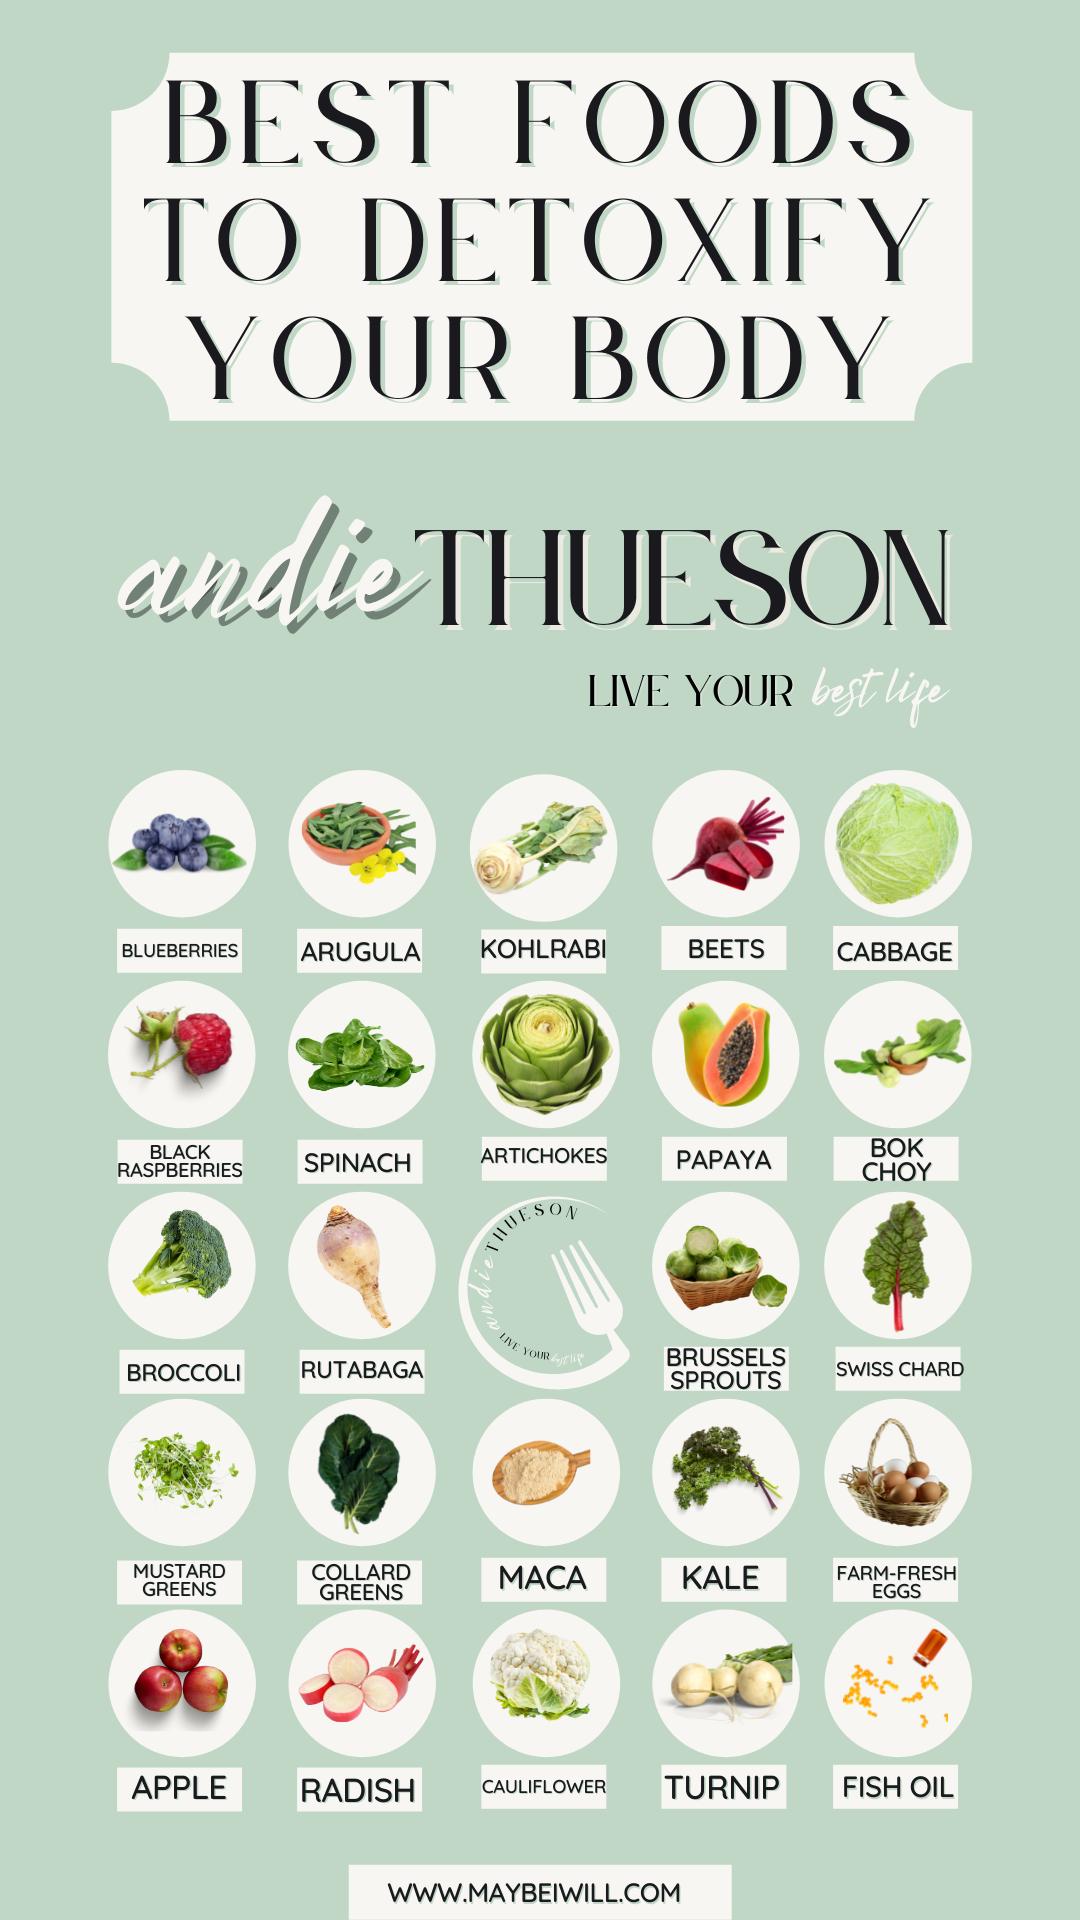 Best Foods To Detoxify Your Body